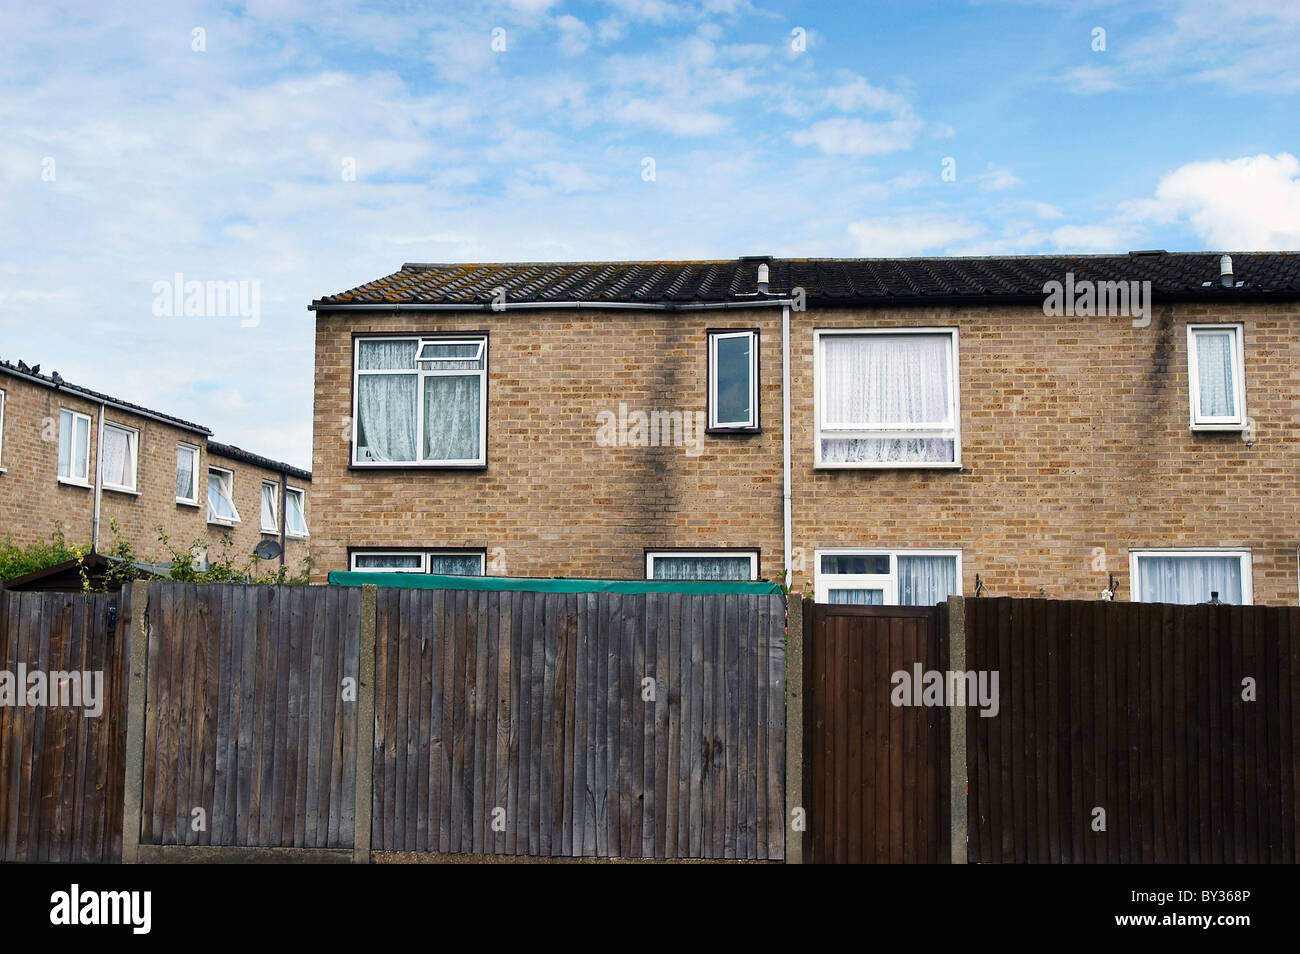 Council estate London. - Stock Image